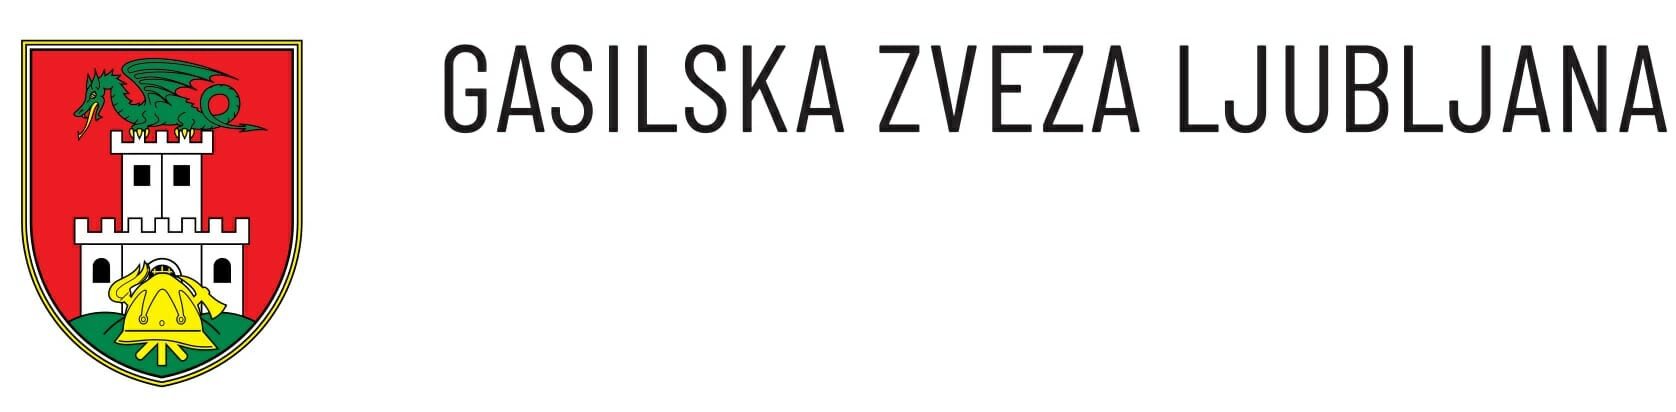 Gasilska zveza Ljubljana